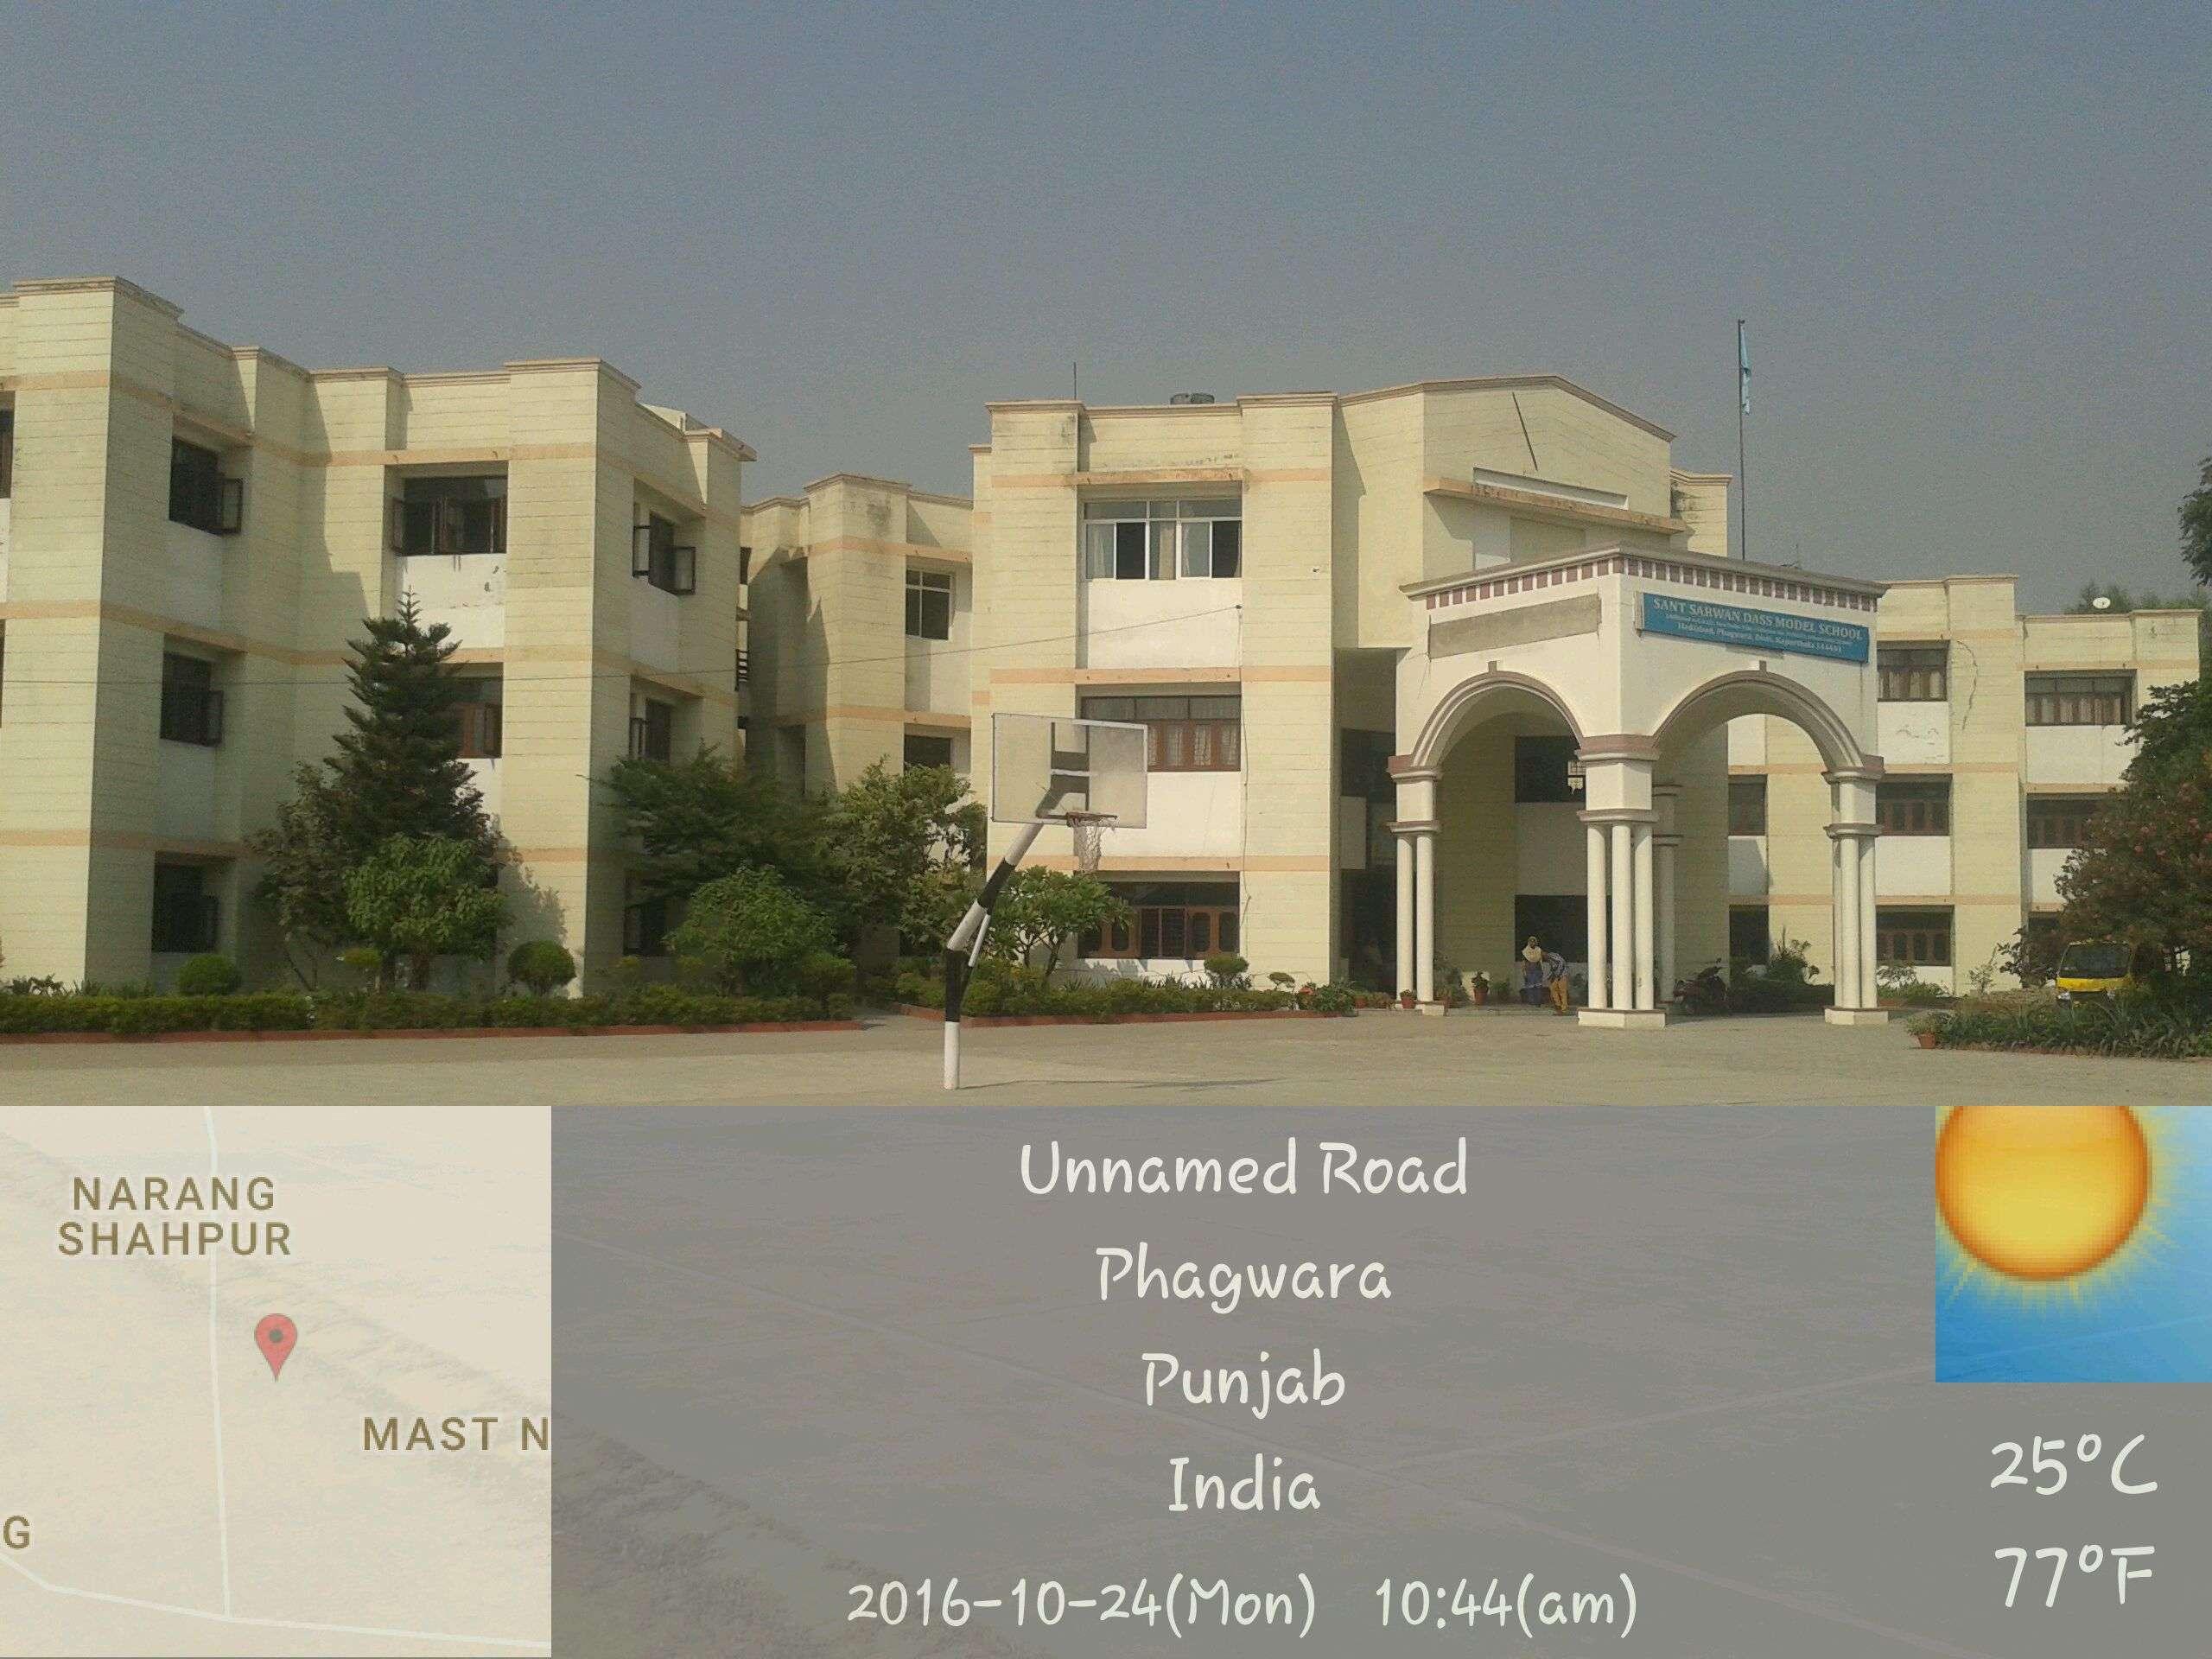 SANT SARWAN DASS MODEL SCHOOL HADIABAD PHAGWARA DISTT KAPURTHALA PUNJAB 1630321